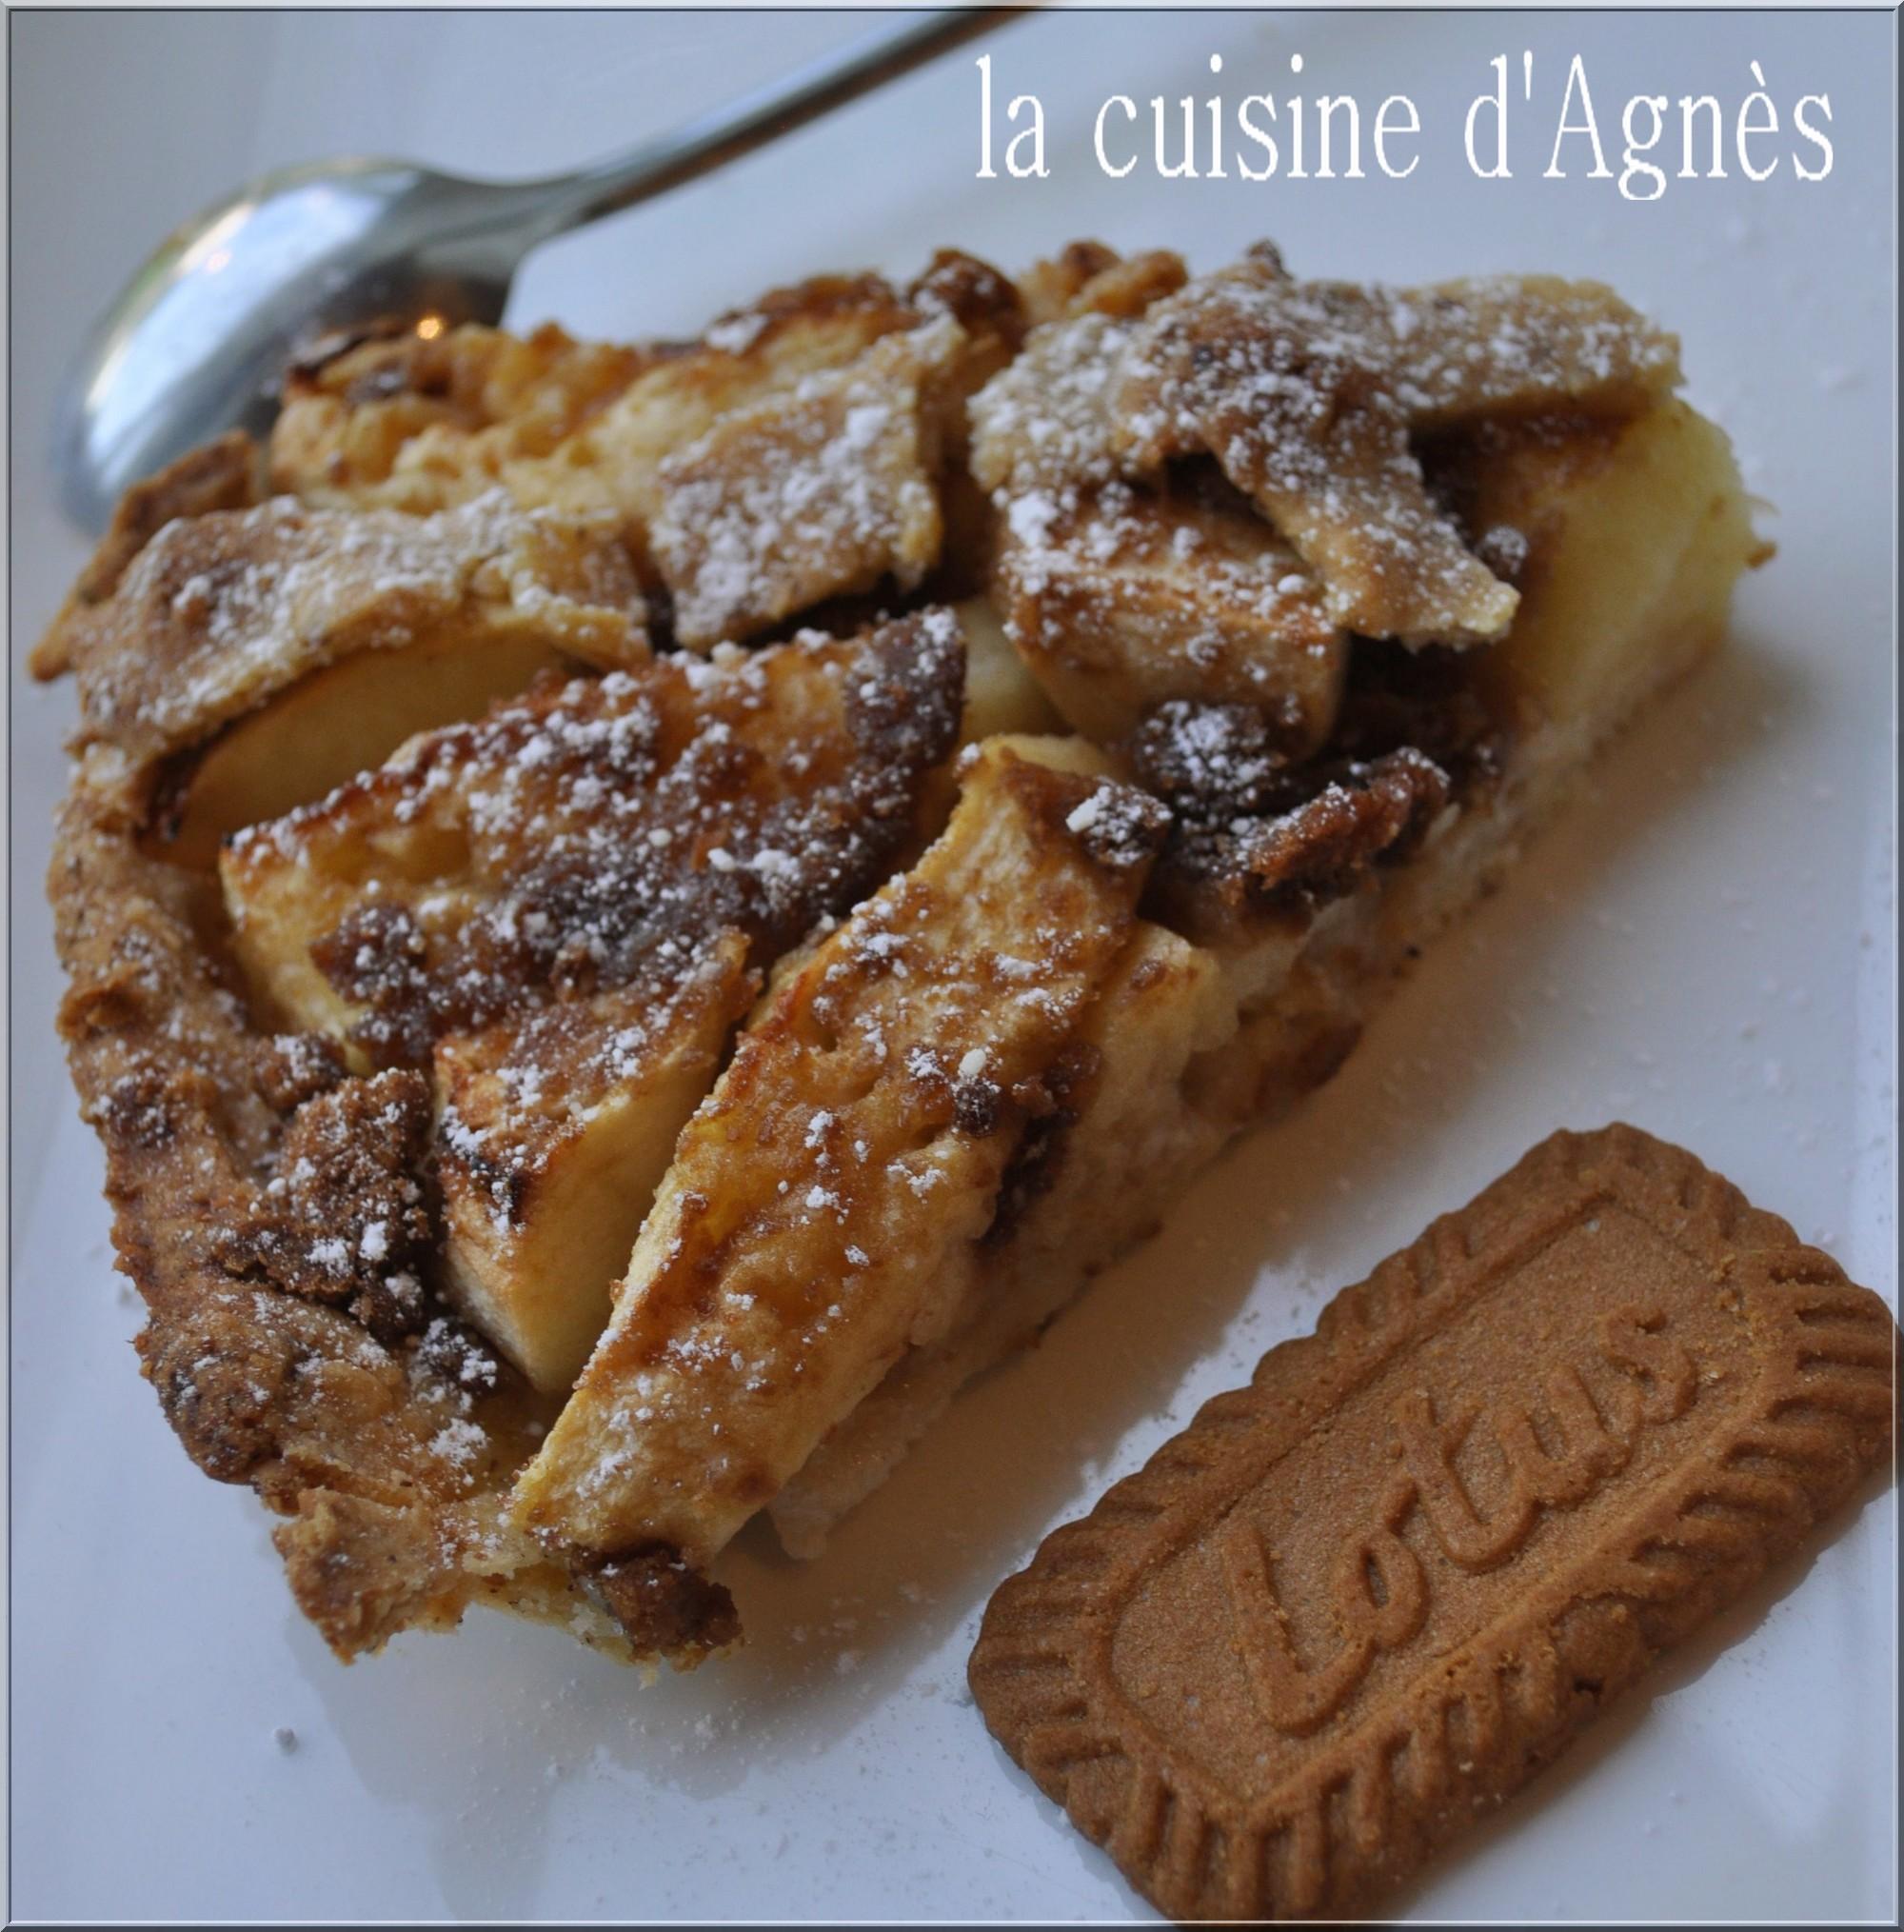 tarte aux pommes et speculoos